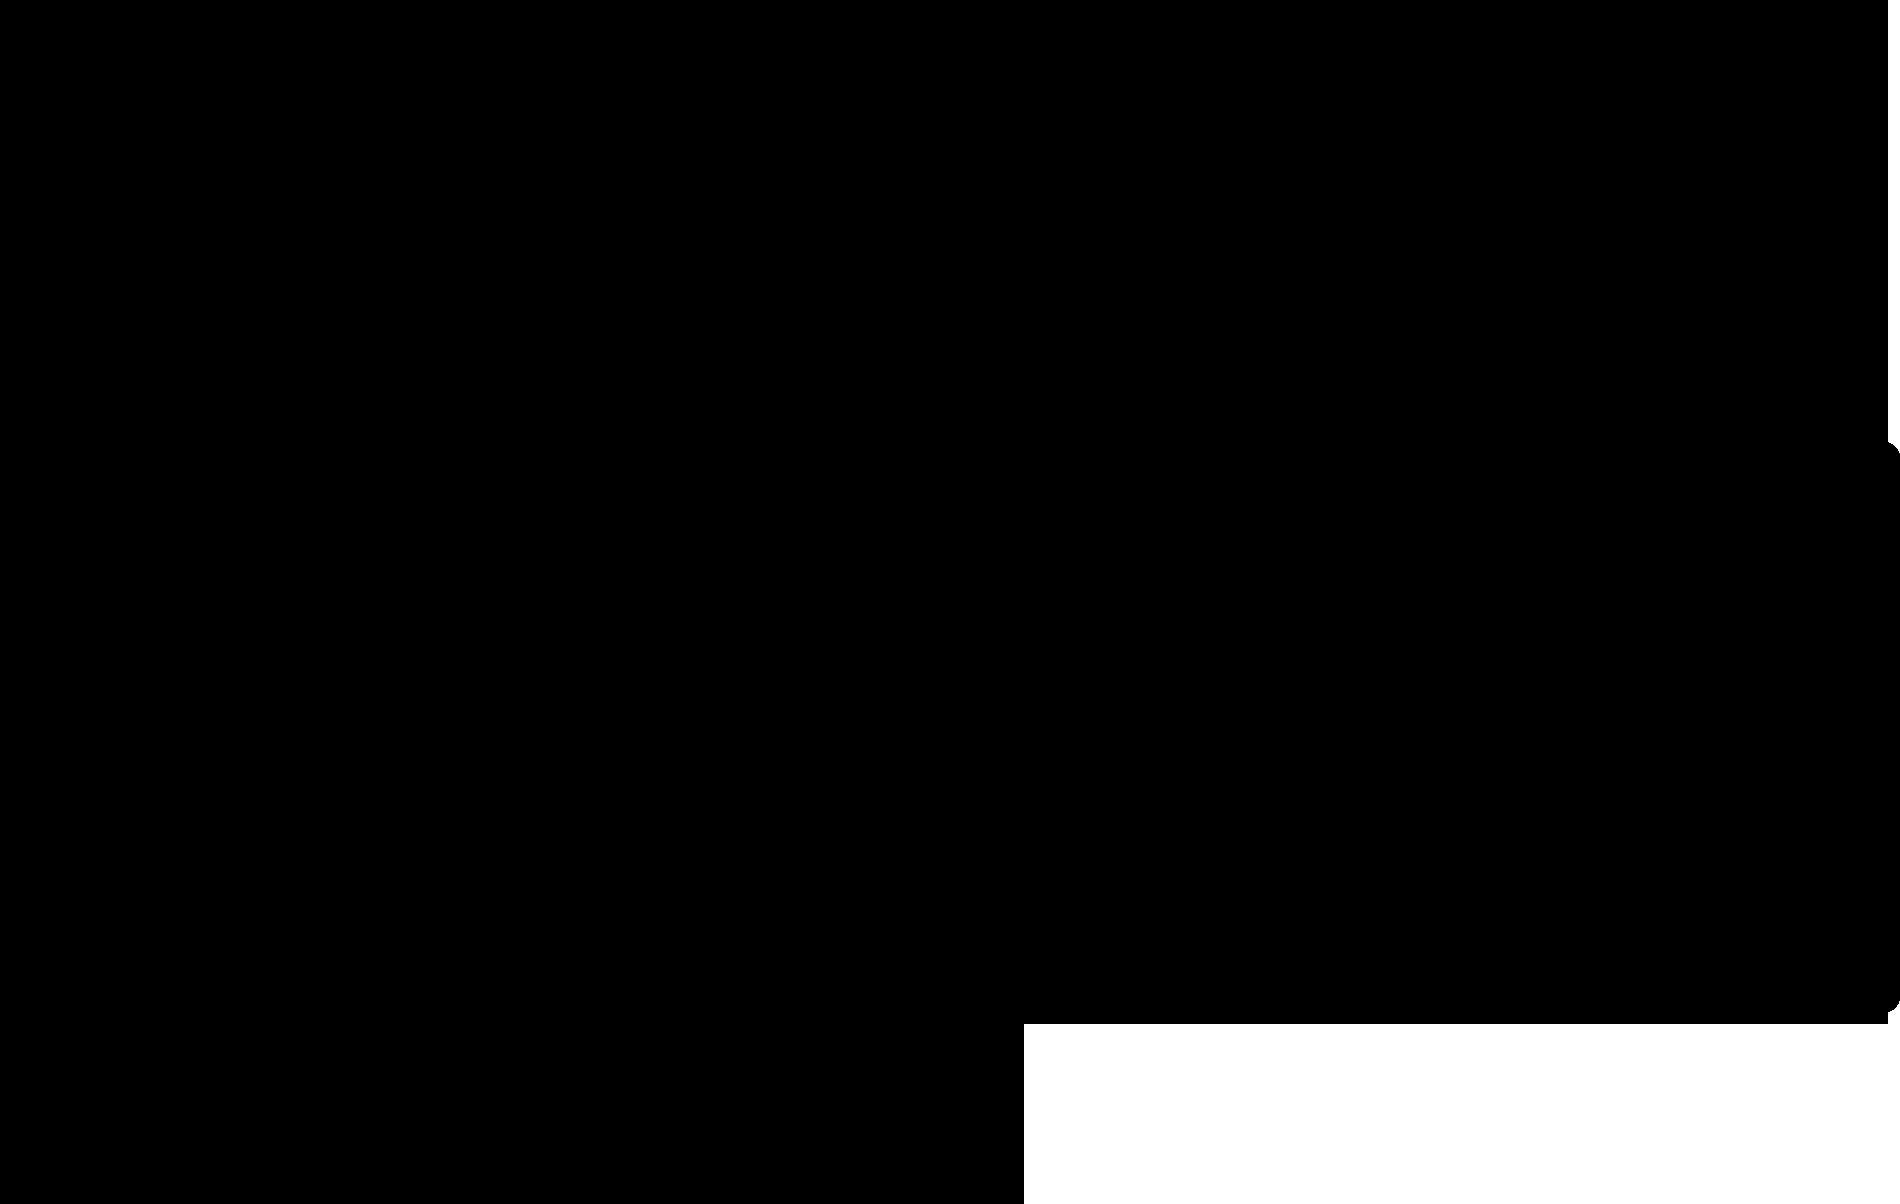 klaud_logo_transparent_bg-black